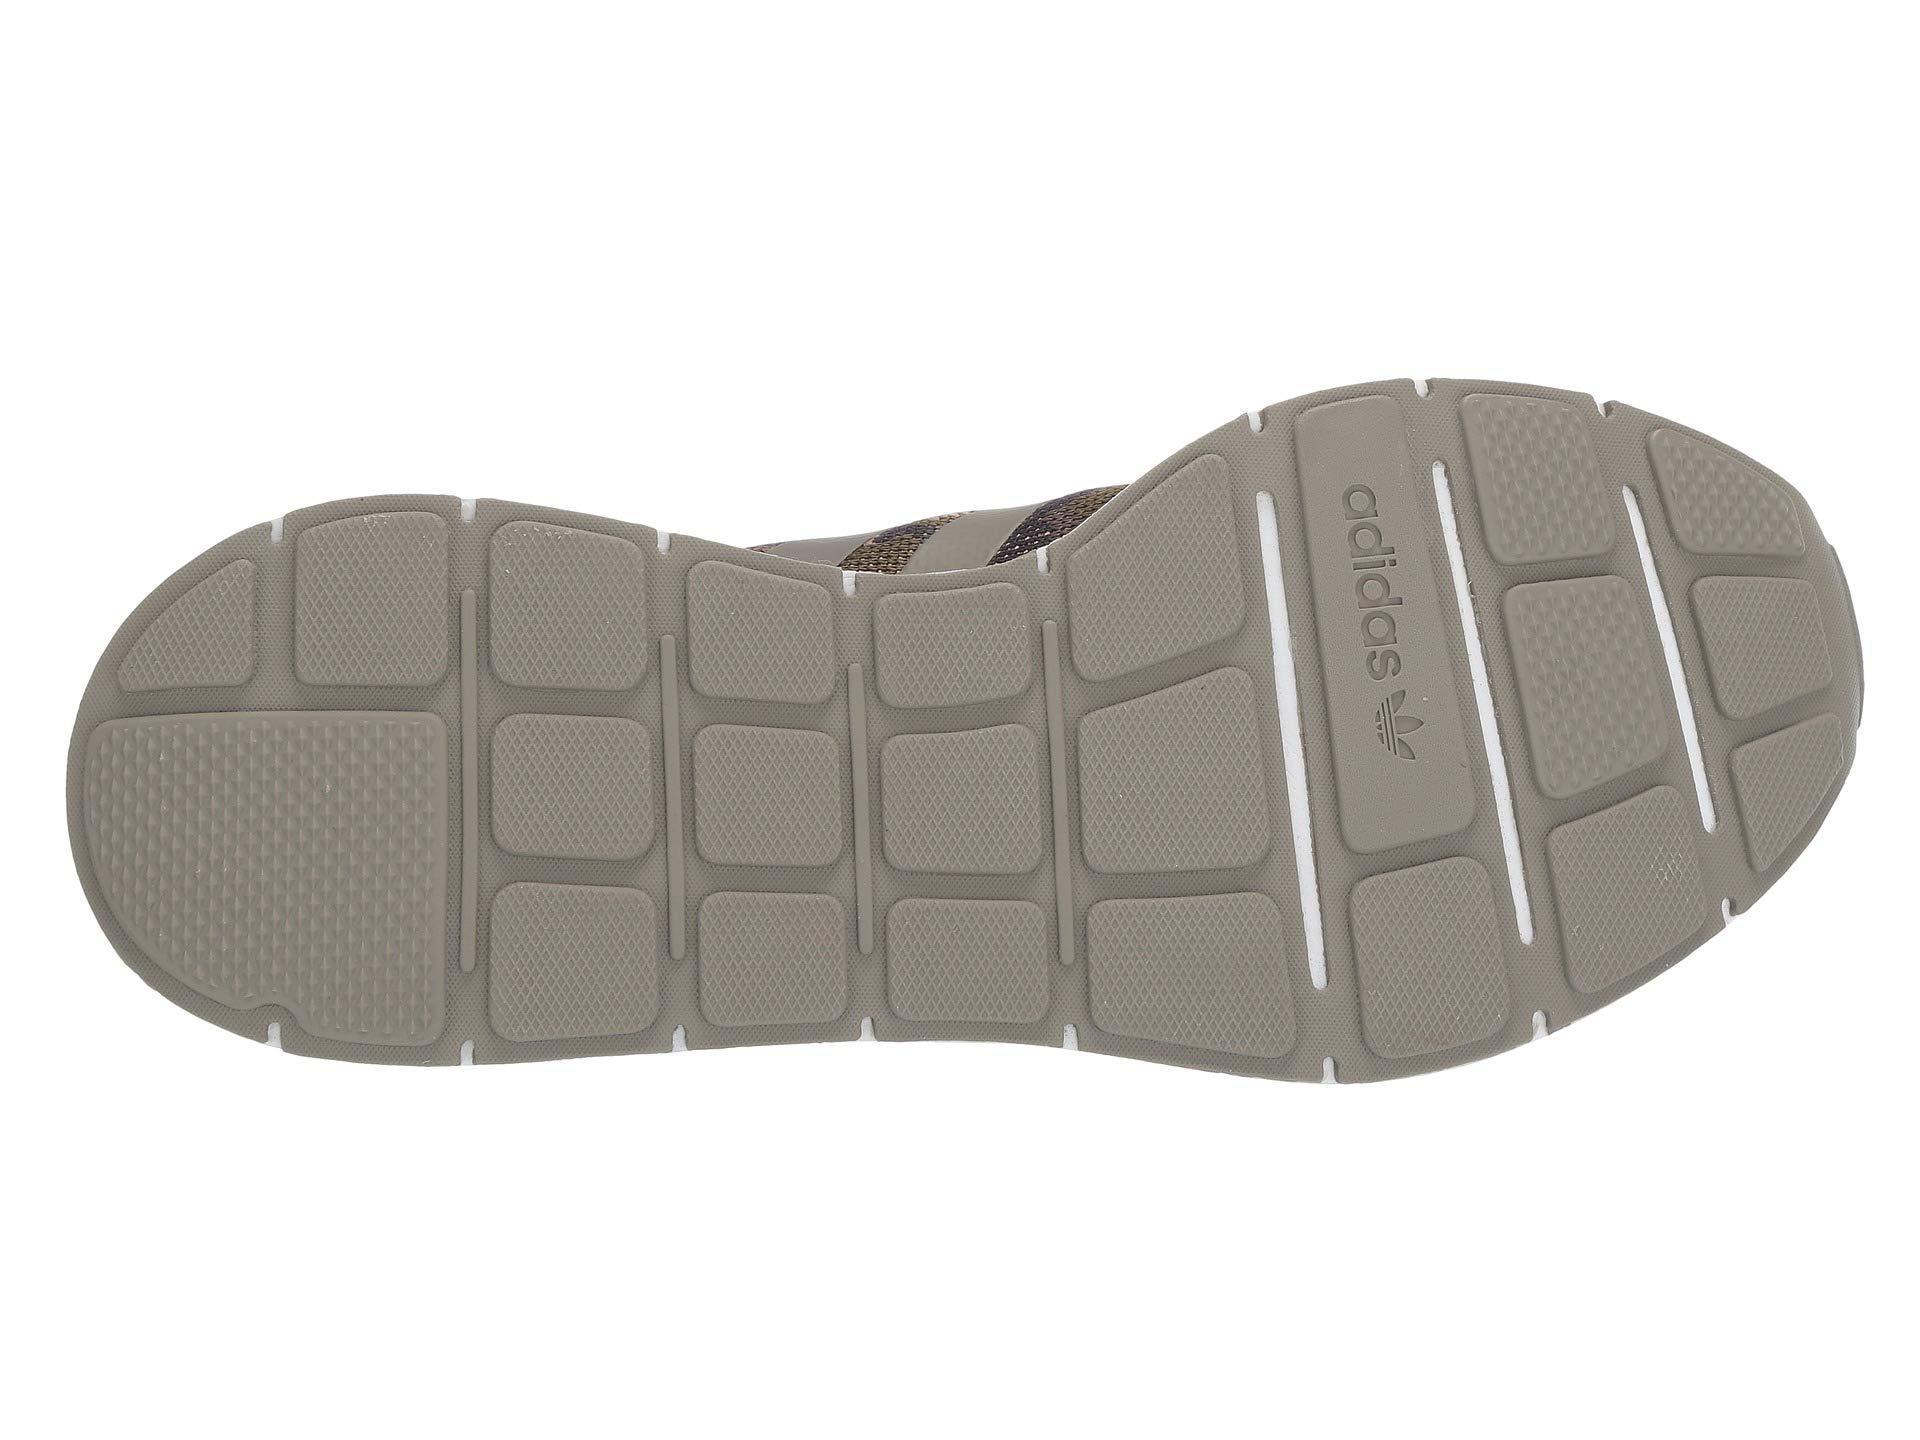 6a005f8dde6 Lyst - adidas Originals Swift Run (night Grey/ash Green/core Black ...